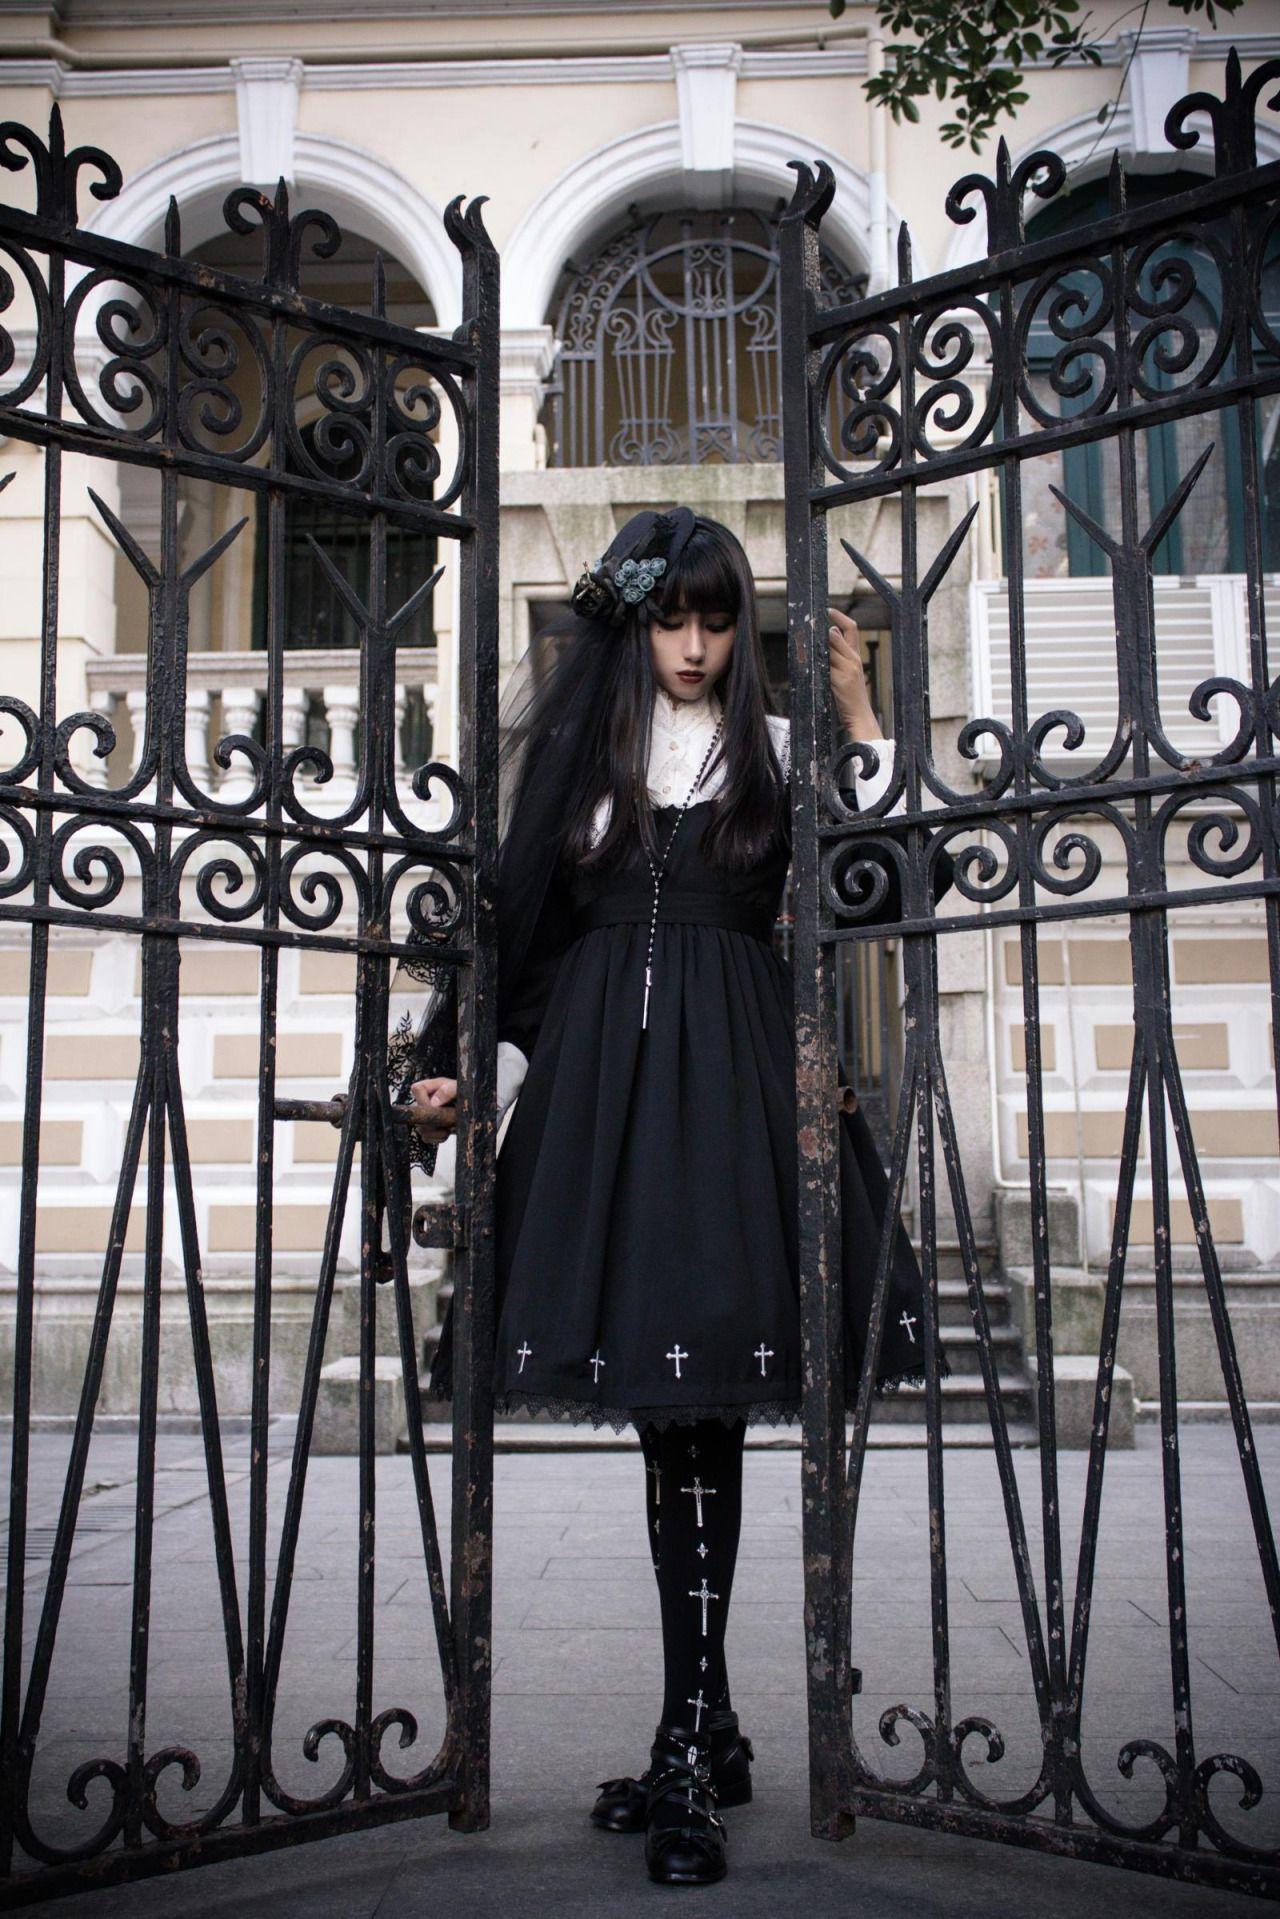 ˆ ˆ beautiful black gothic lolita dress and headpiece fashion